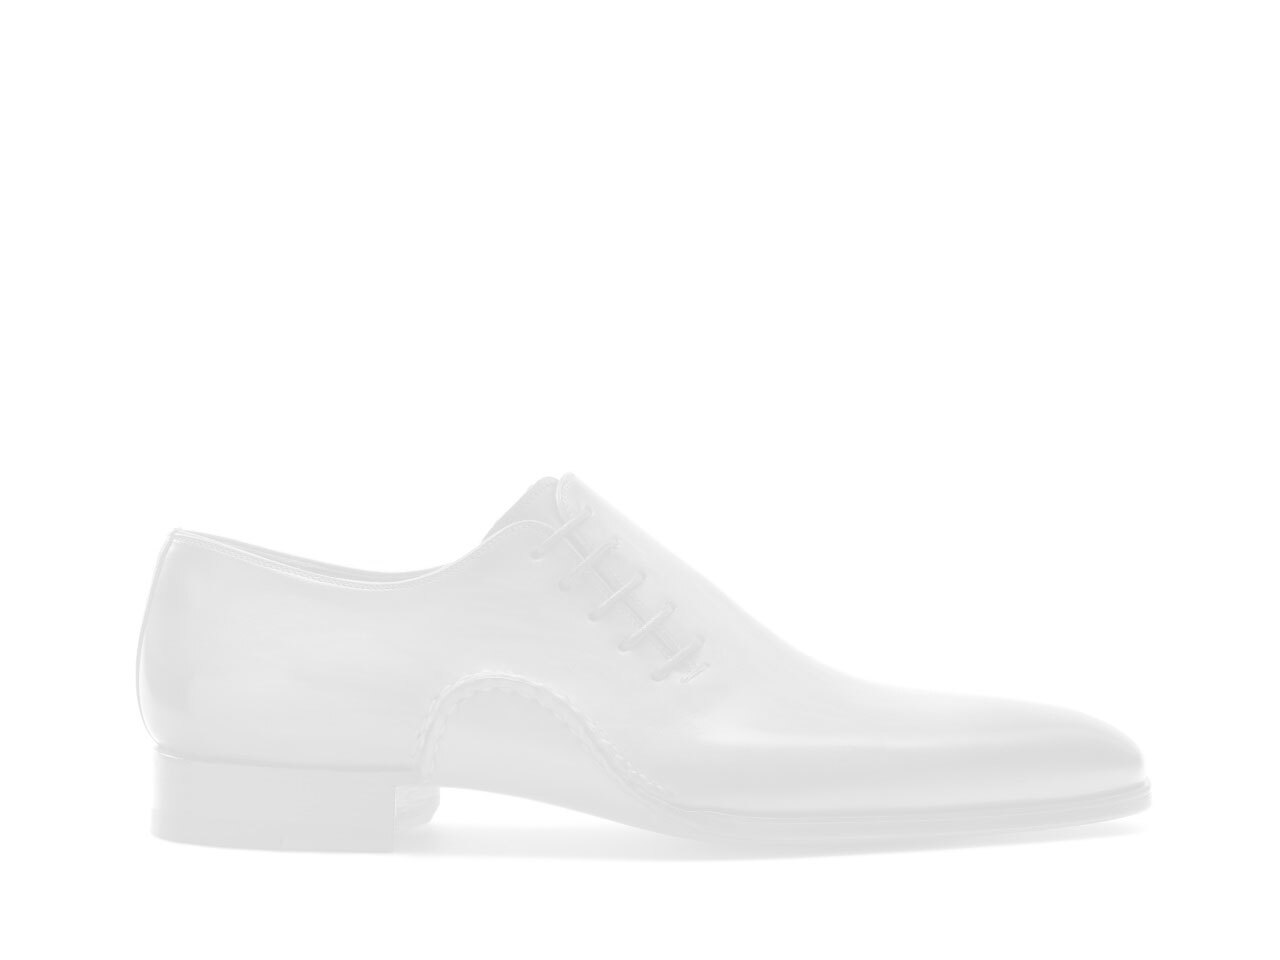 Side view of the Magnanni Marco II Cognac Suede Men's Single Monk Strap Shoes